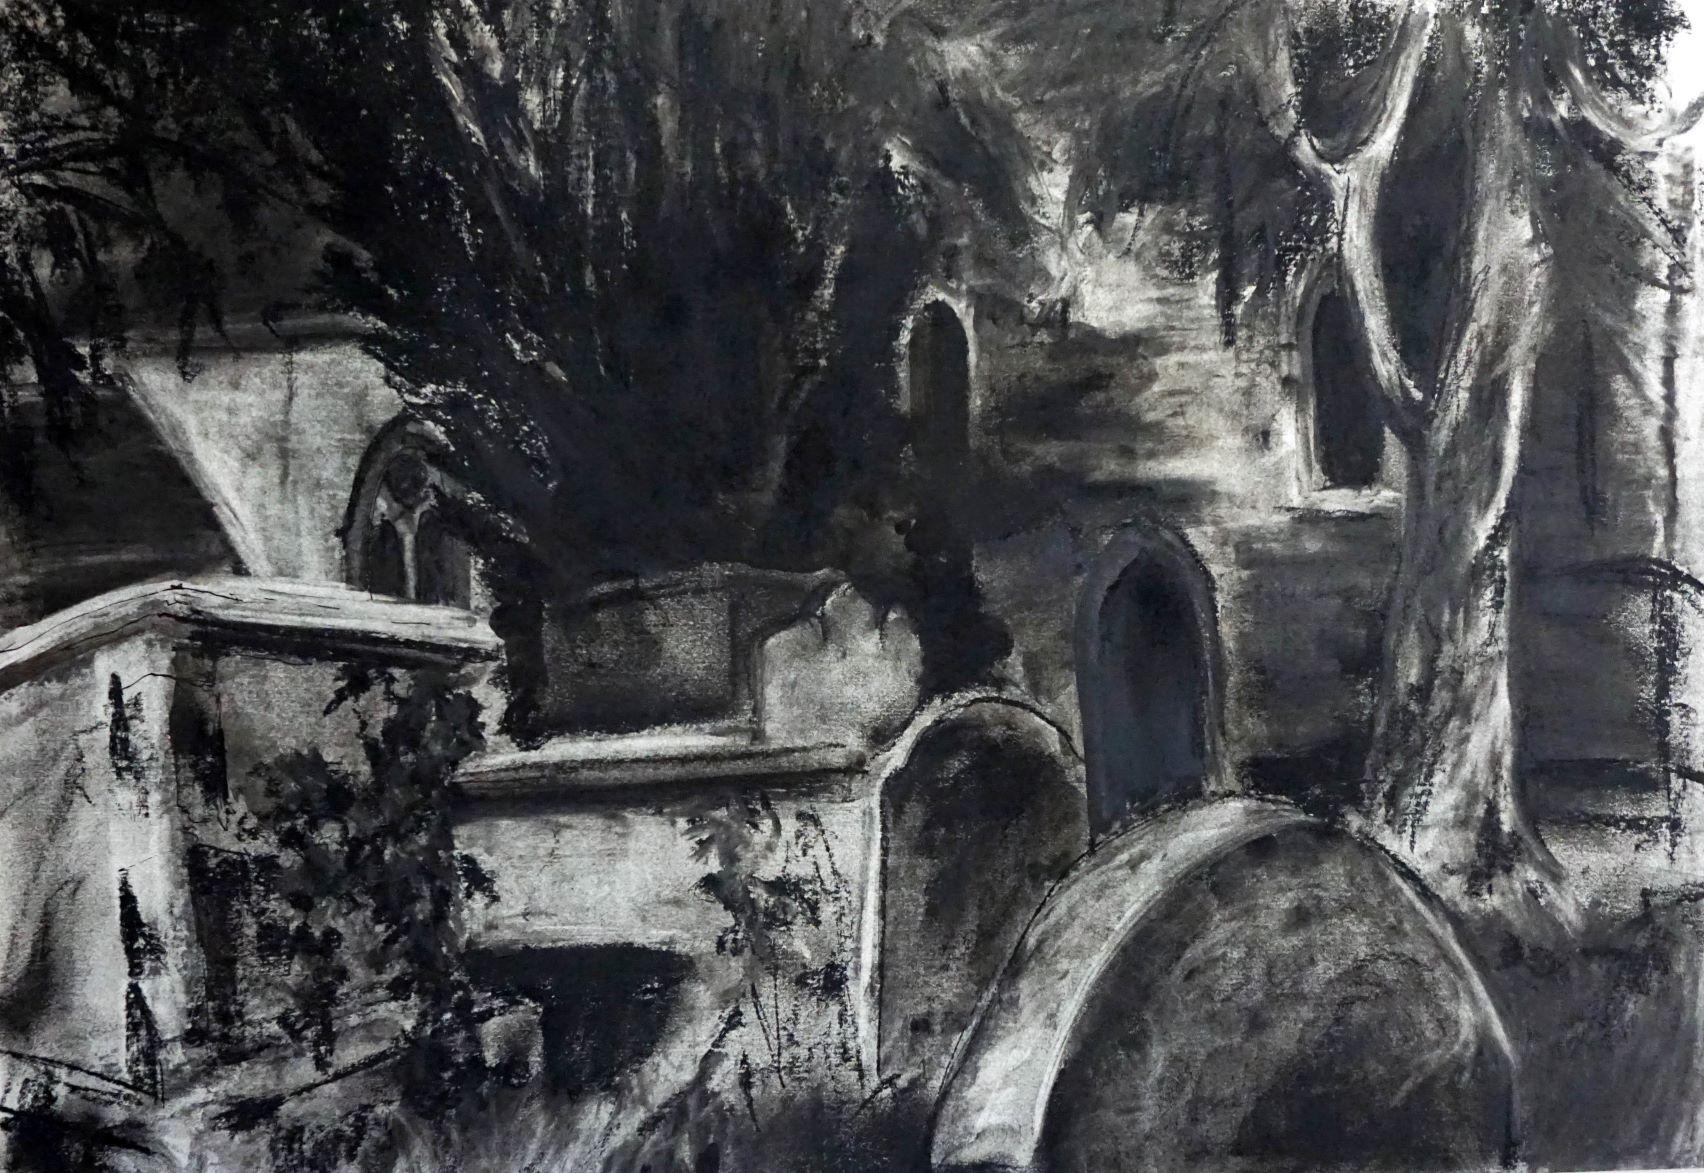 Clyro churchyard small